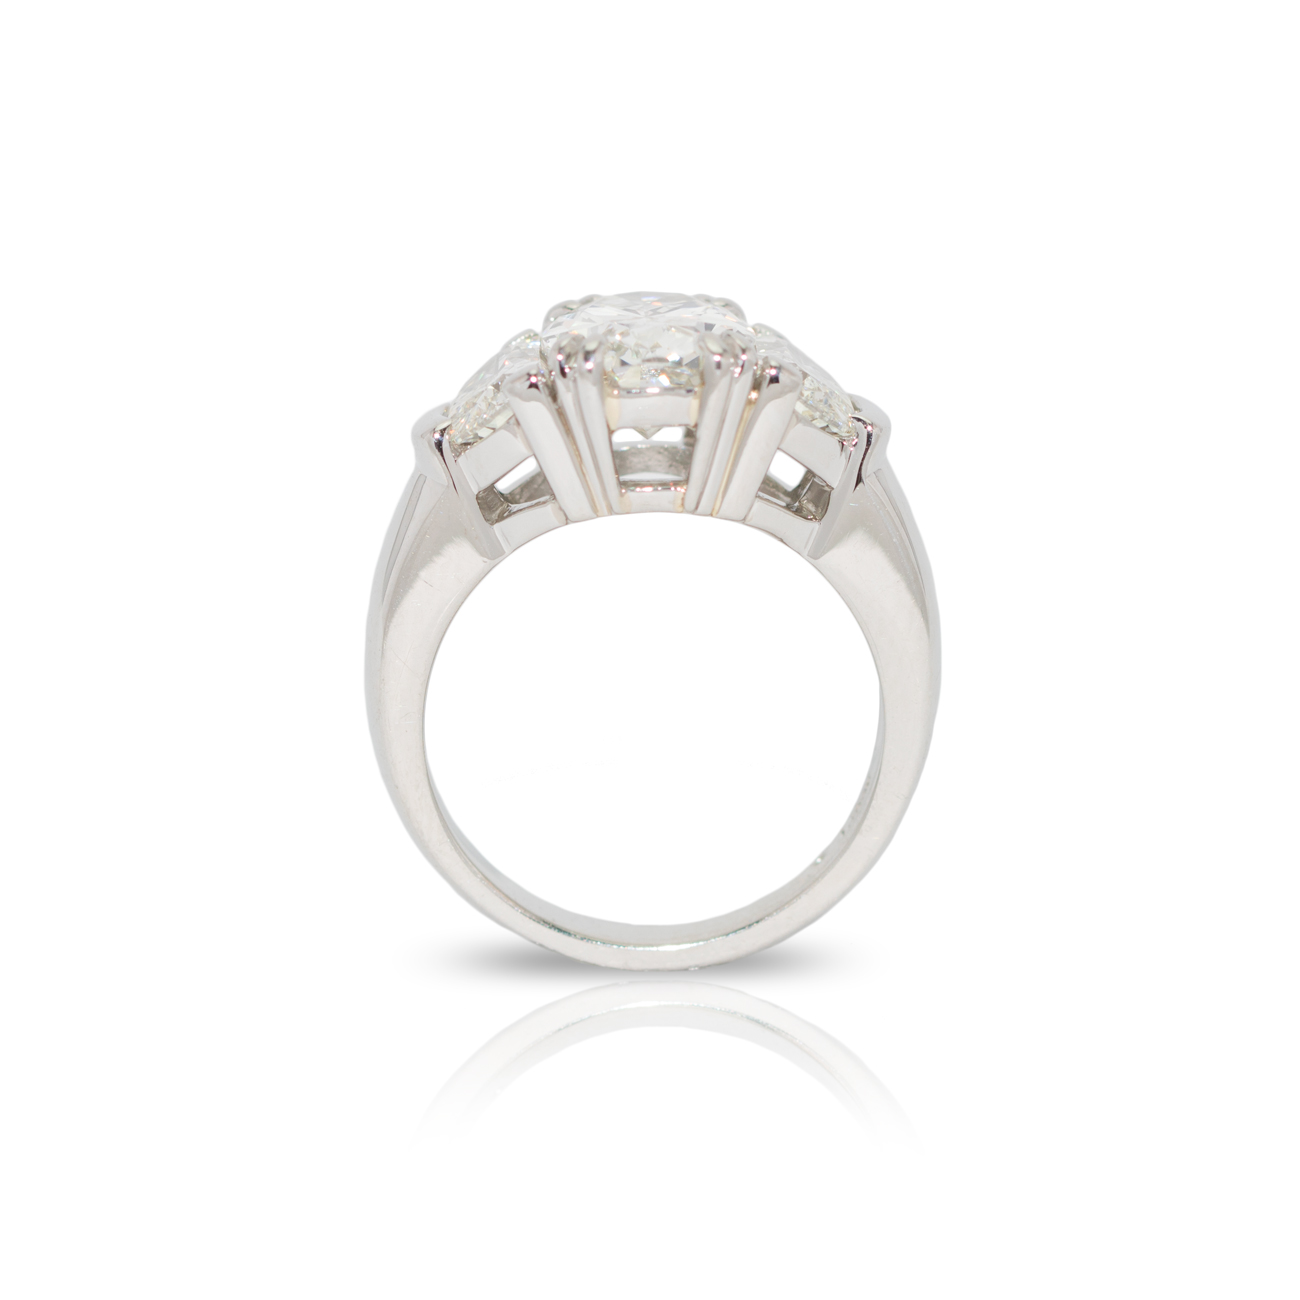 Custom Platinum 3 Stone Diamond And Half Moon Ring Cdbcr035 Menashe Sons Jewelers